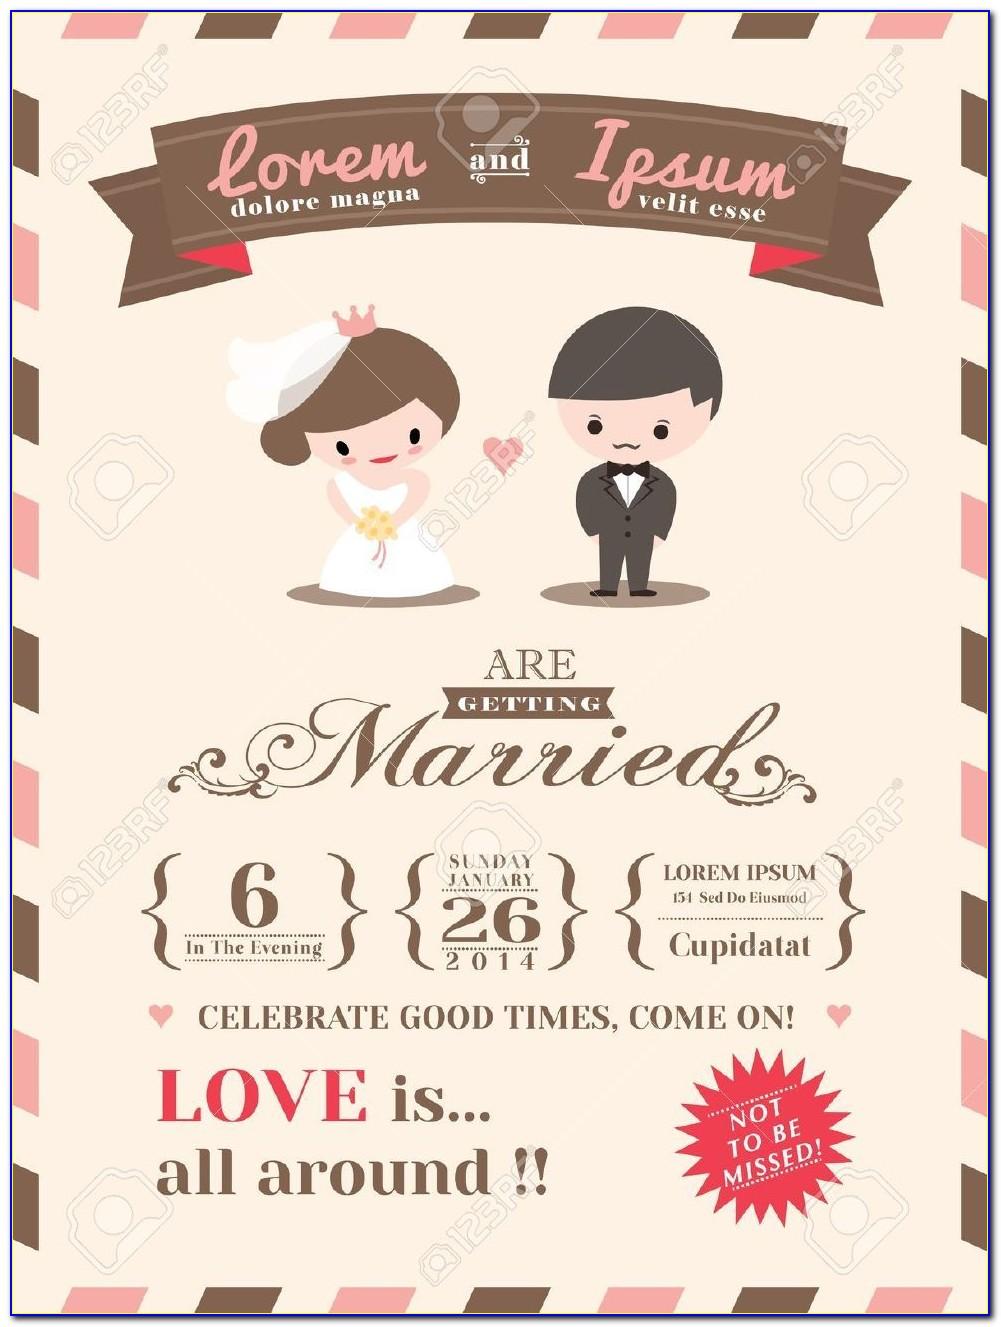 Christian Wedding Card Designs Templates